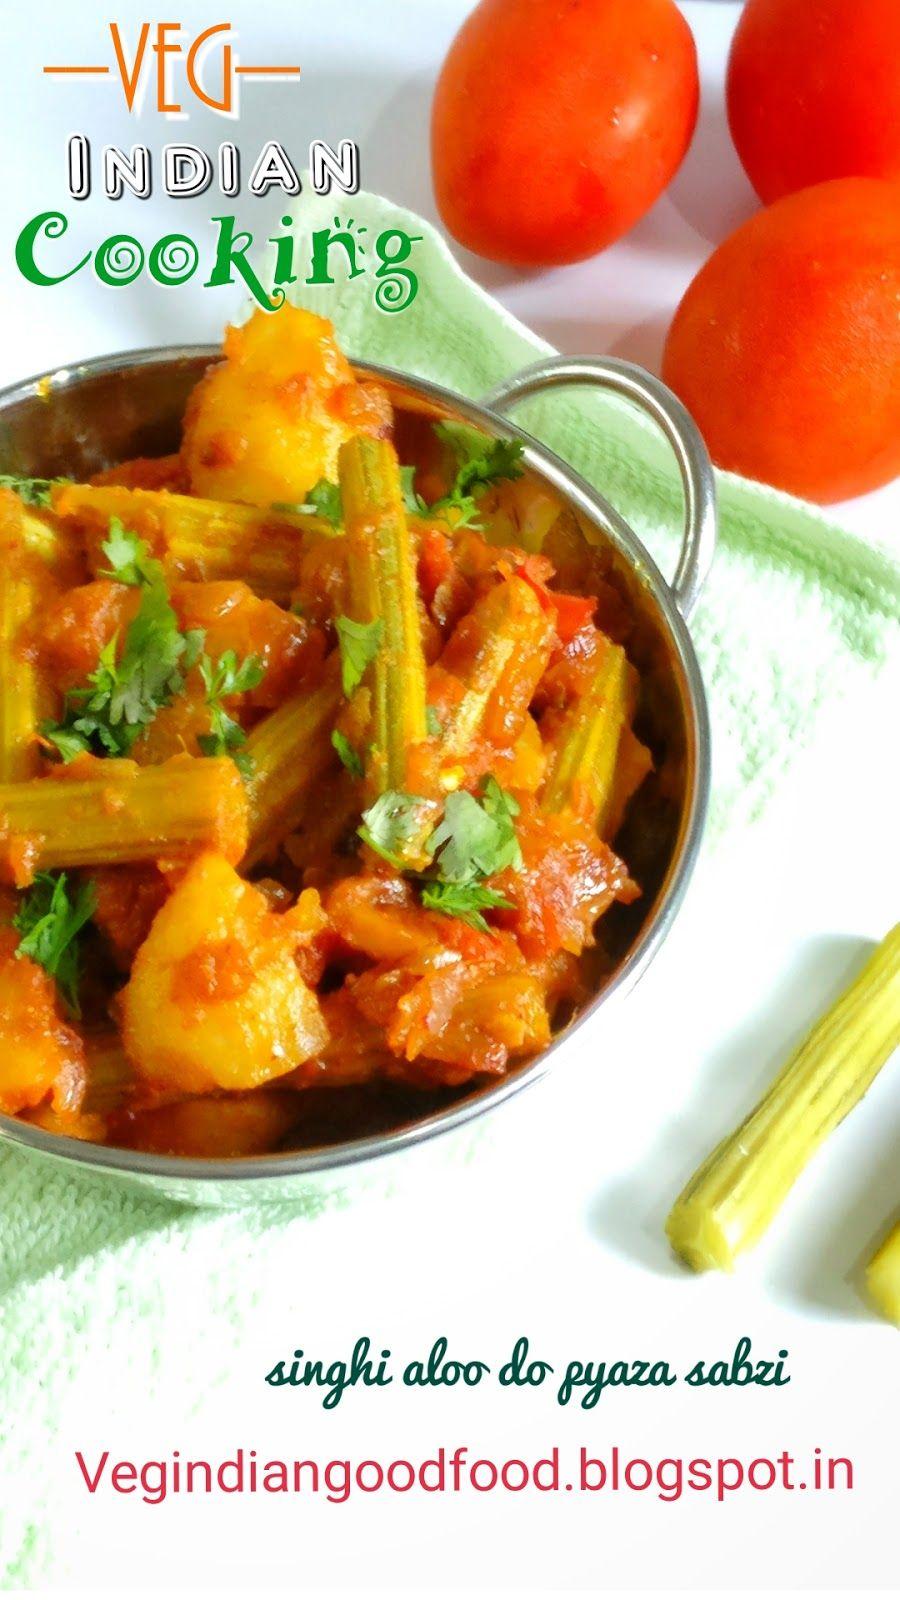 How To Make Sahjan Aloo Do Pyaza Recipe Drumstick Potato Vegetable In Spicy Onion Tomato G Drumstick Recipes Indian Food Recipes Vegetarian Moringa Recipes